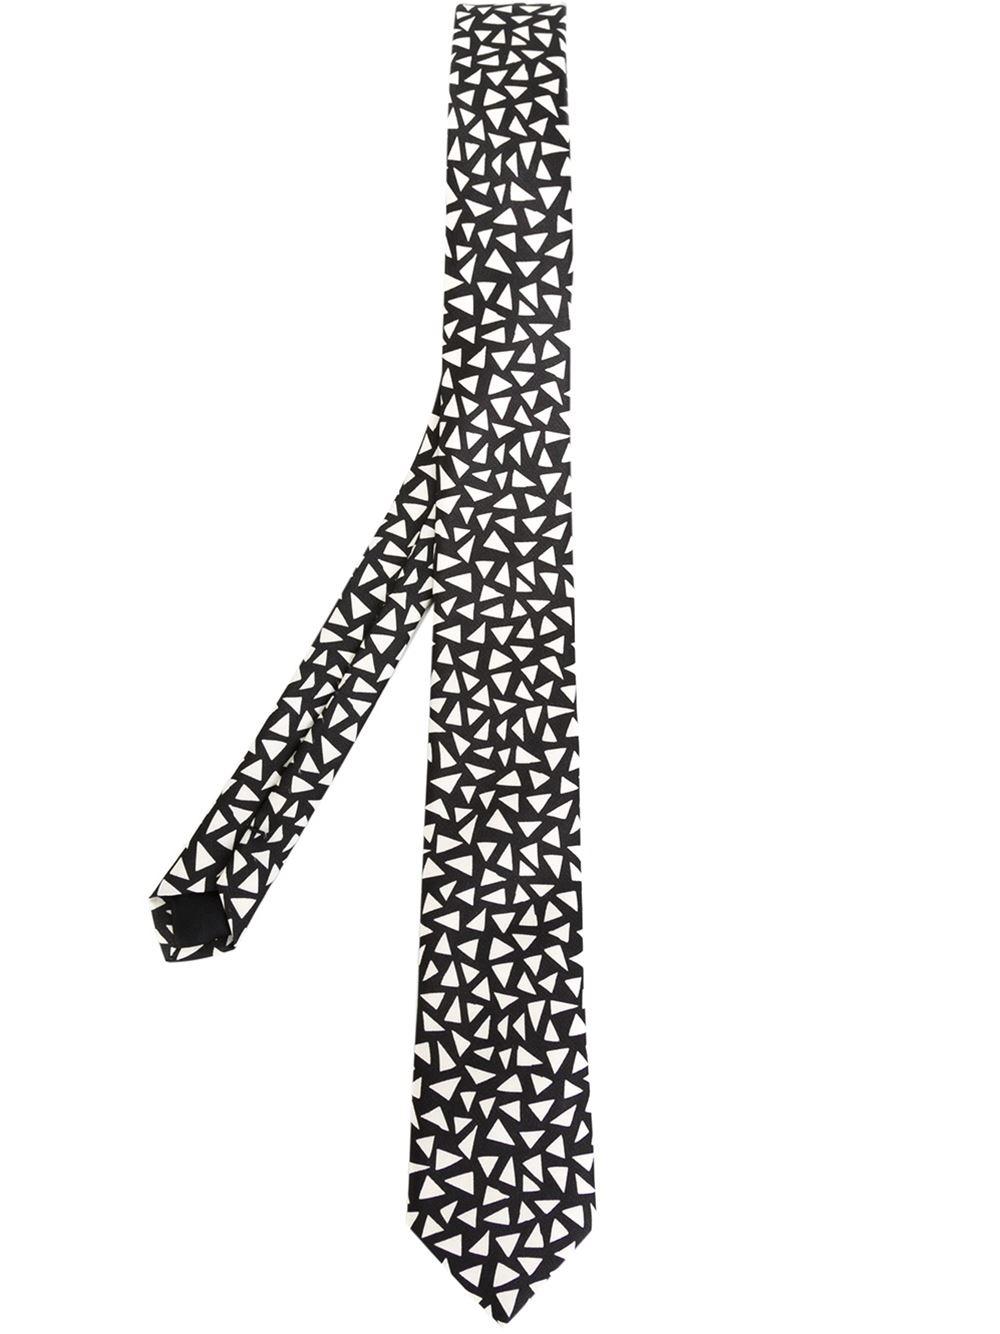 0a1dd4951580f Lyst - Saint Laurent Triangular Print Tie in Black for Men